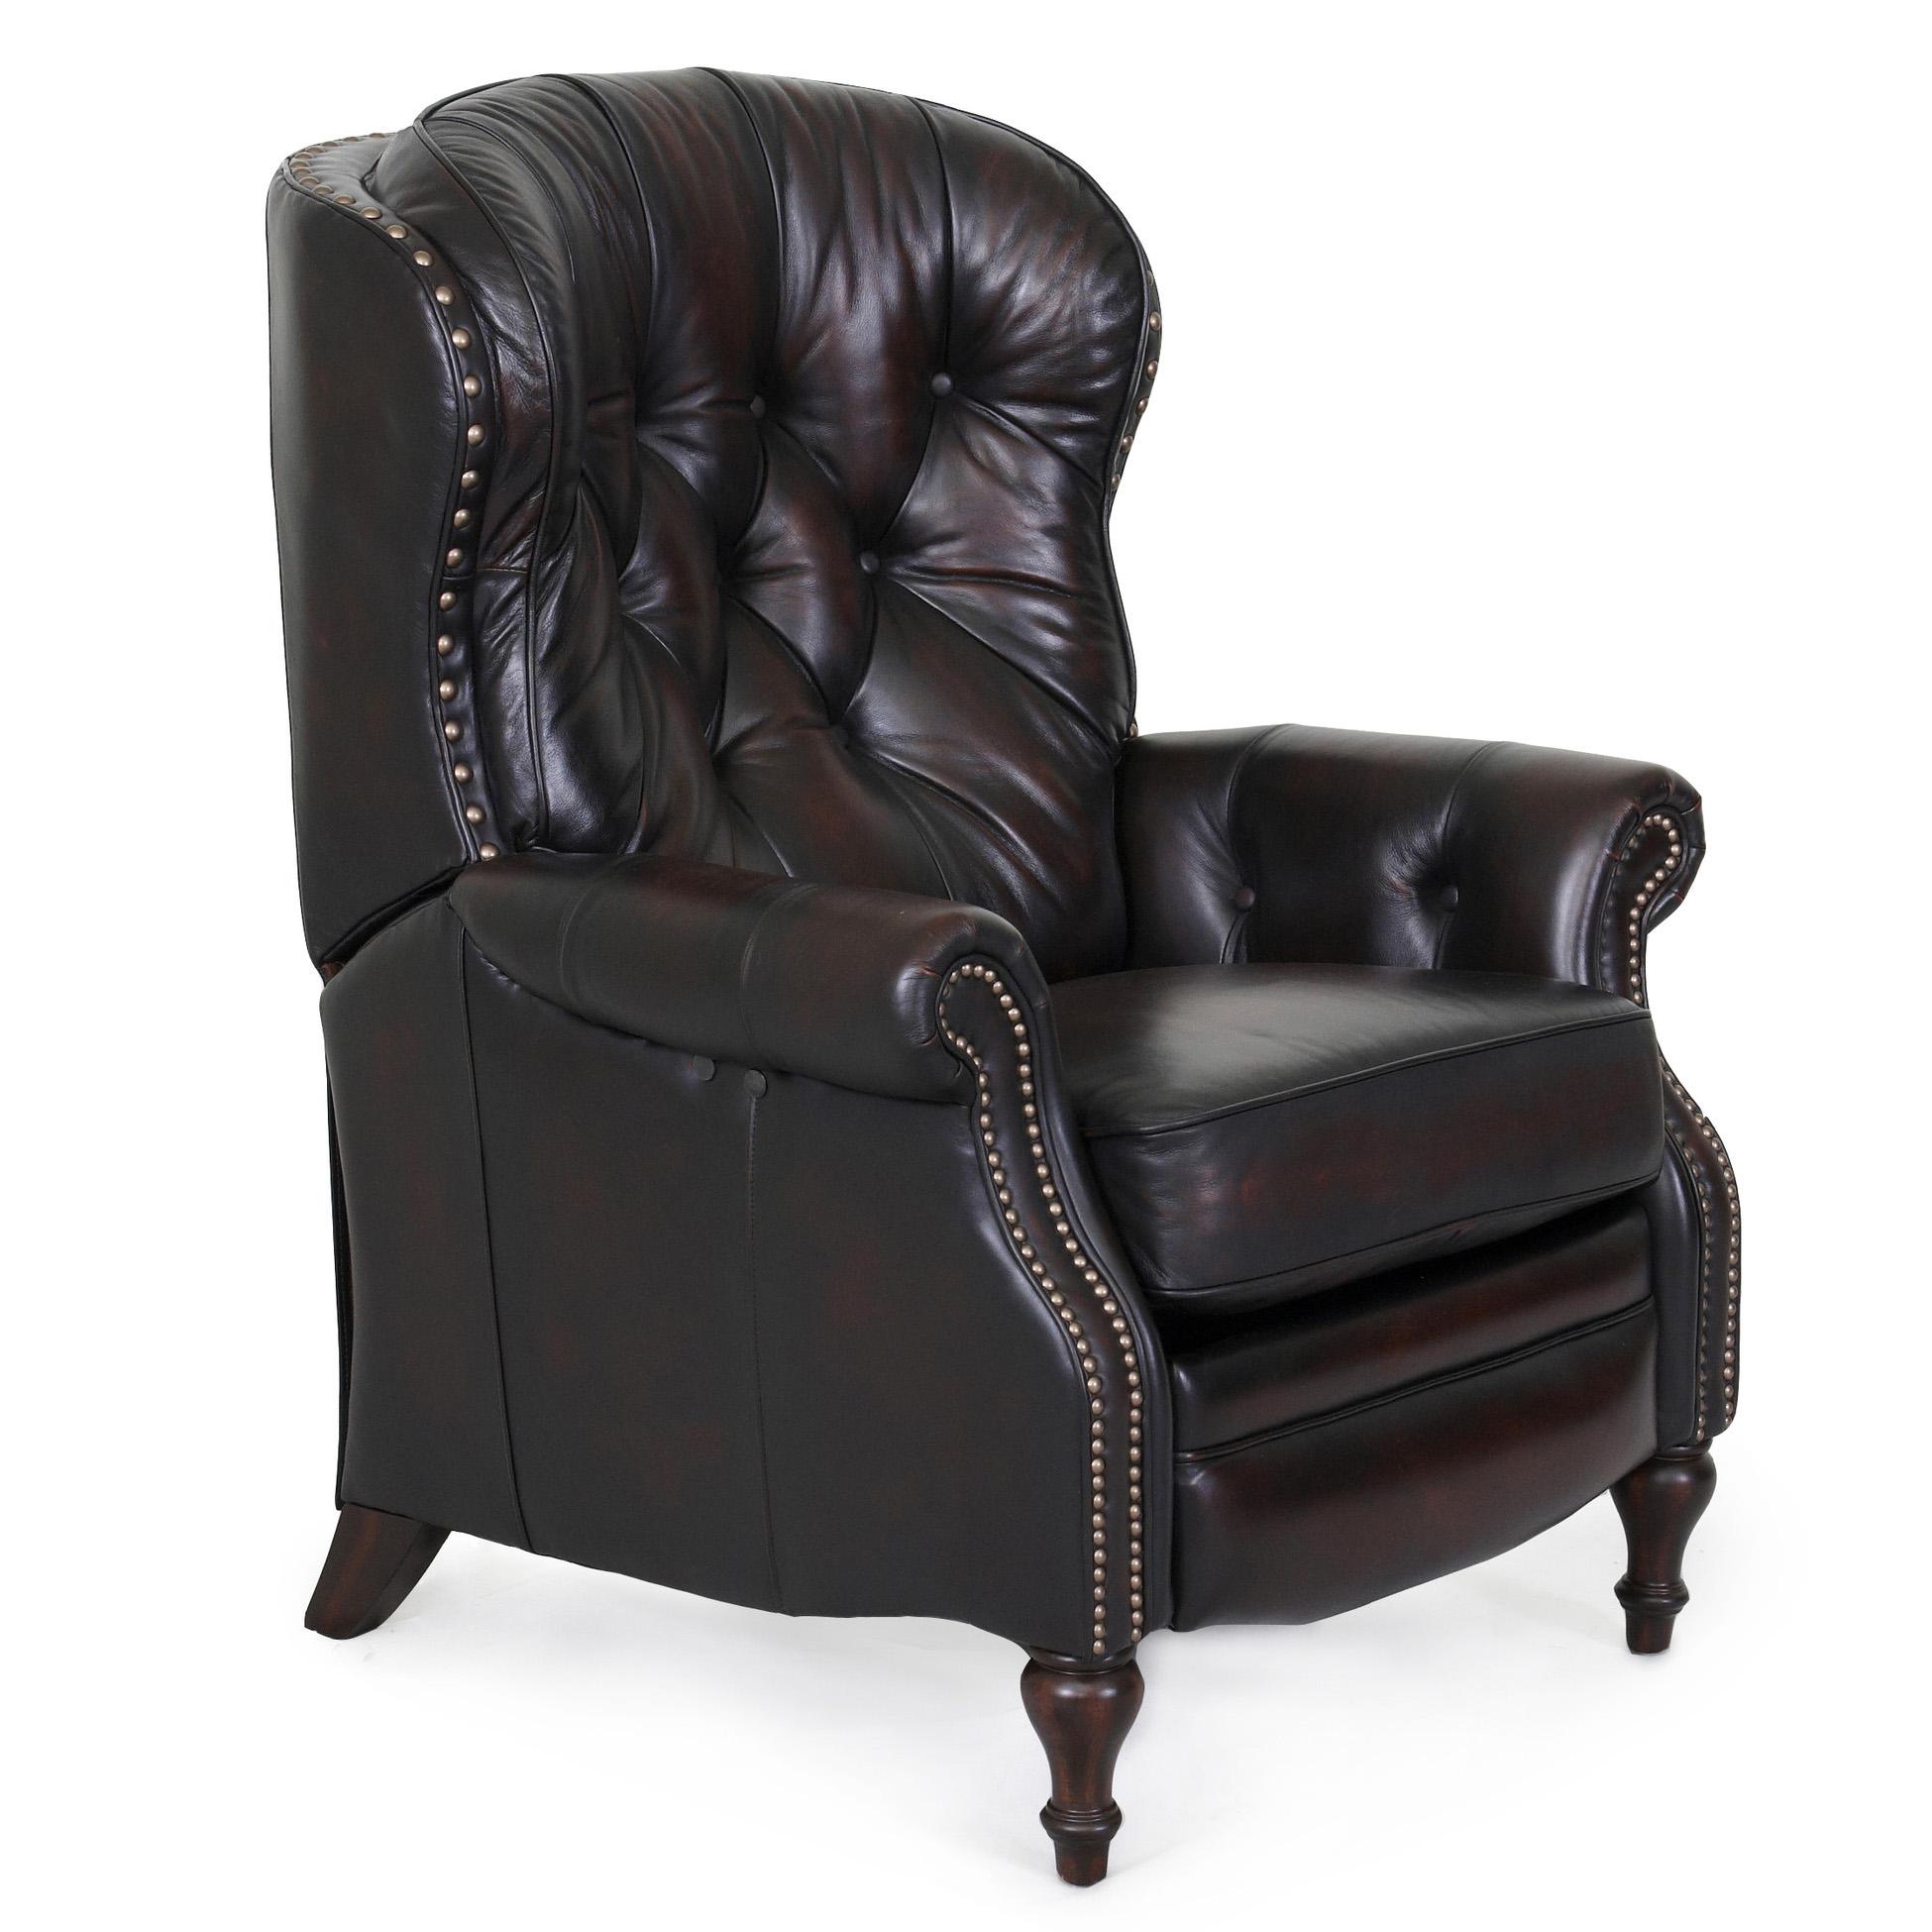 Barcalounger Kendall II Recliner Chair  Leather Recliner